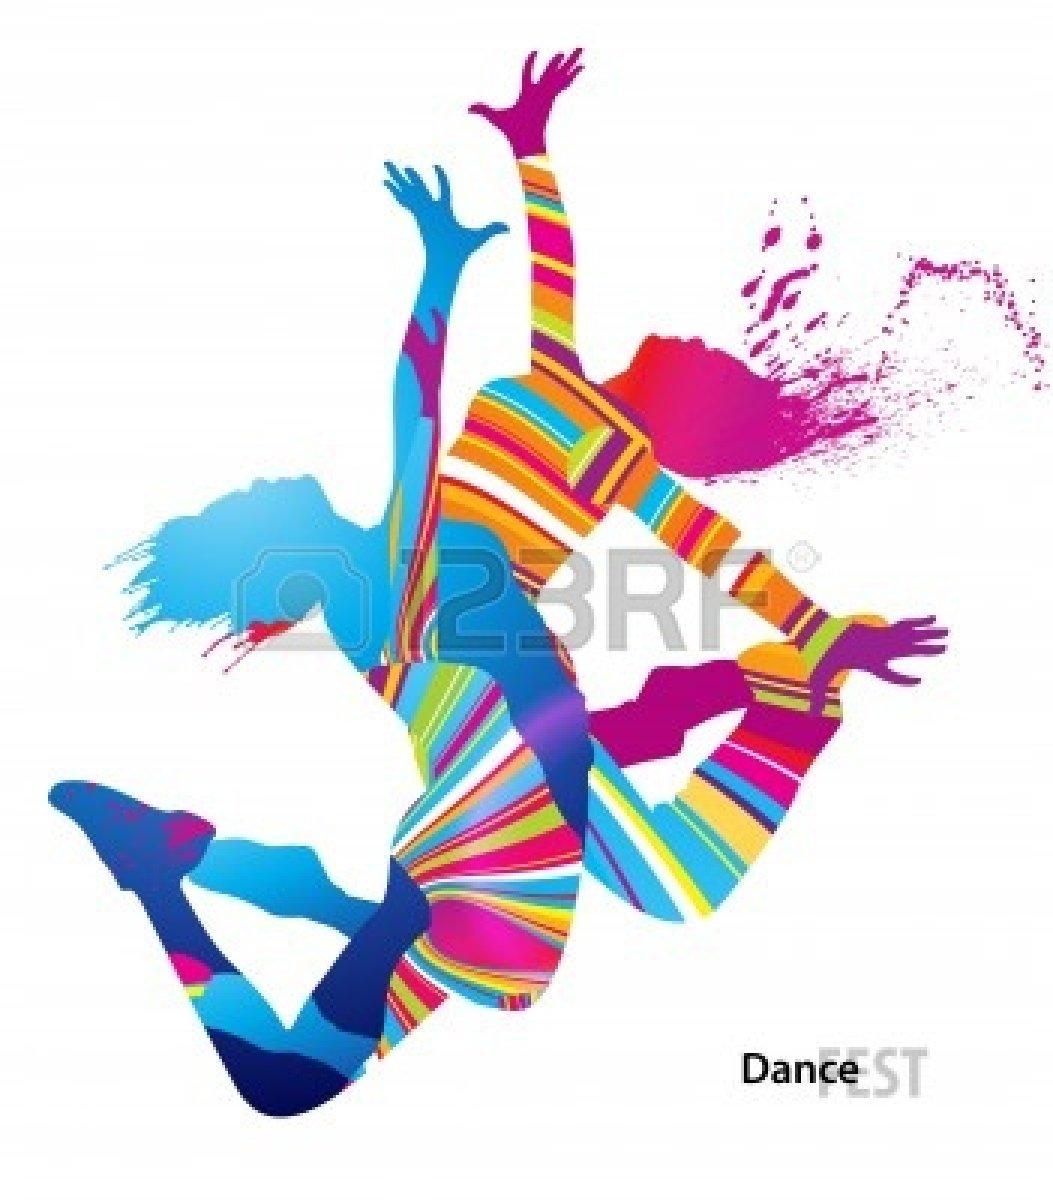 dance party clipart - photo #40